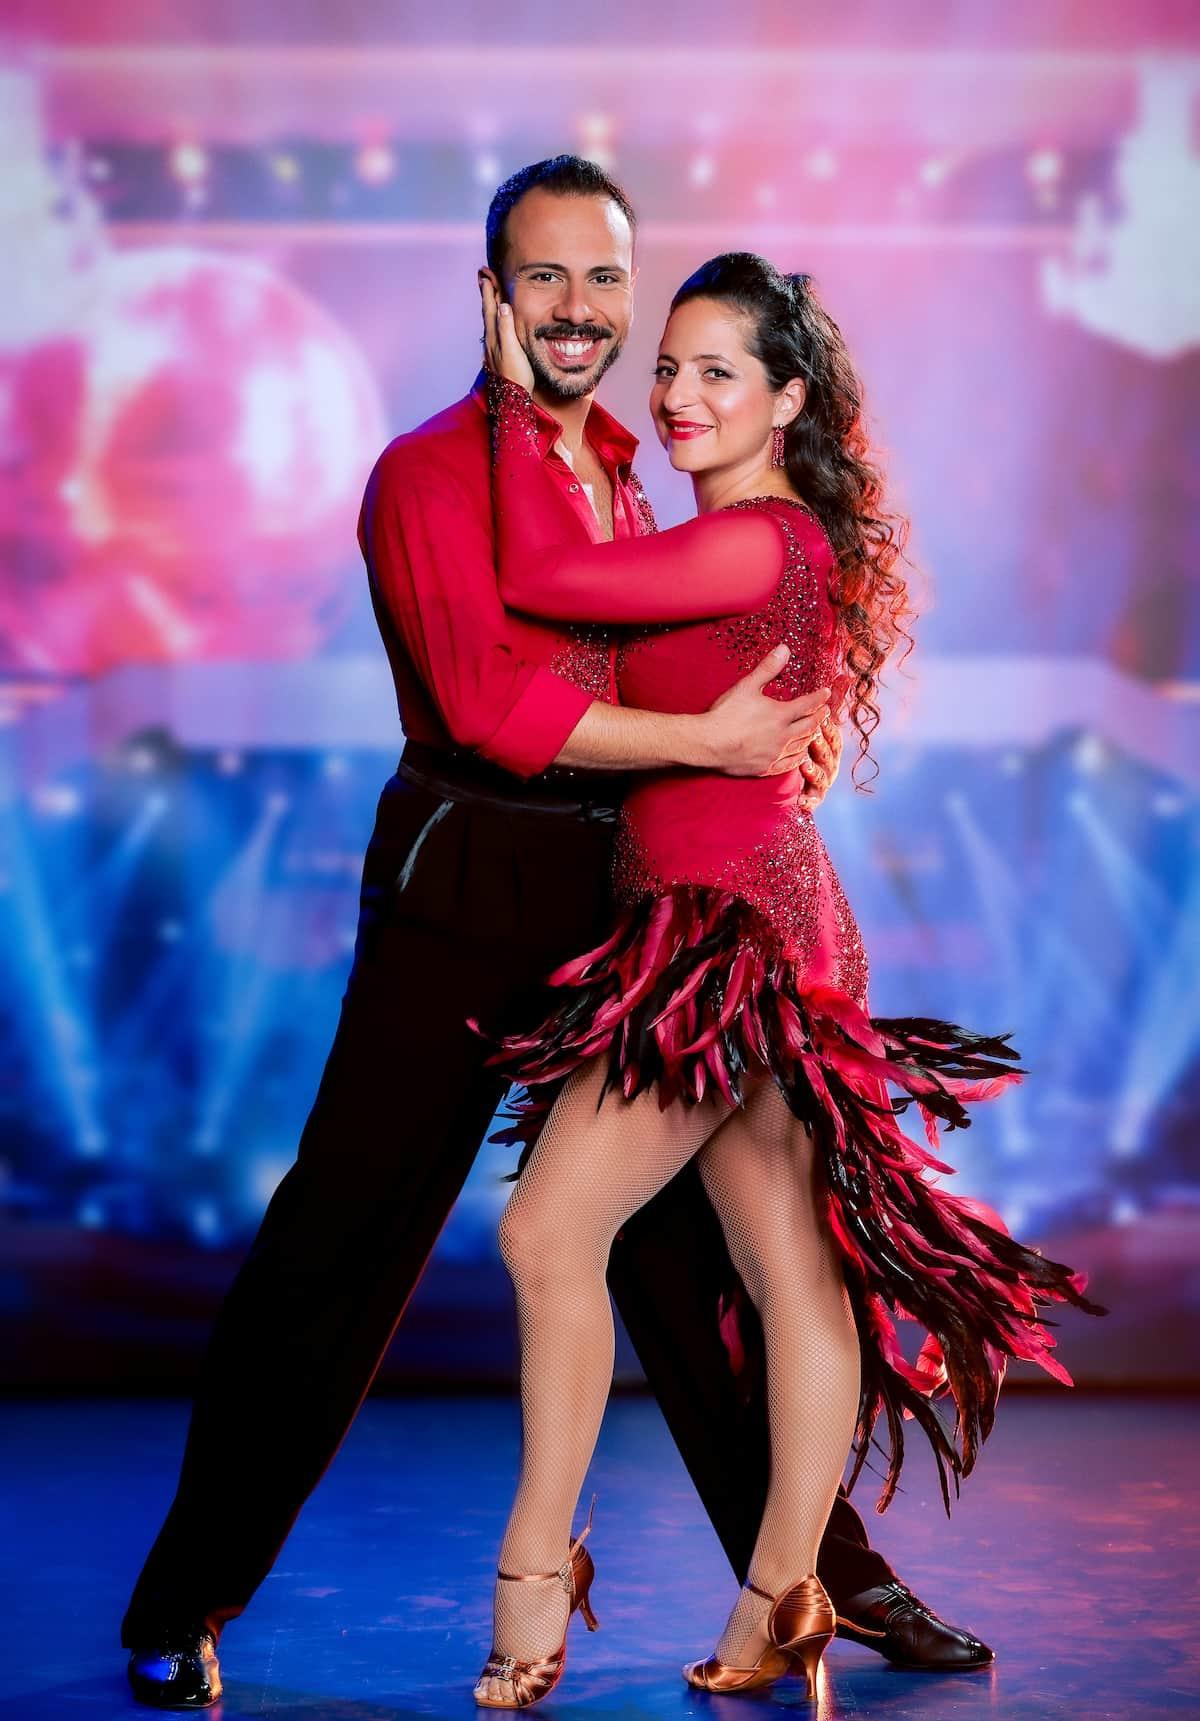 Caroline Athanasiadis und Danilo Campisi bei den Dancing Stars 24.9.2021